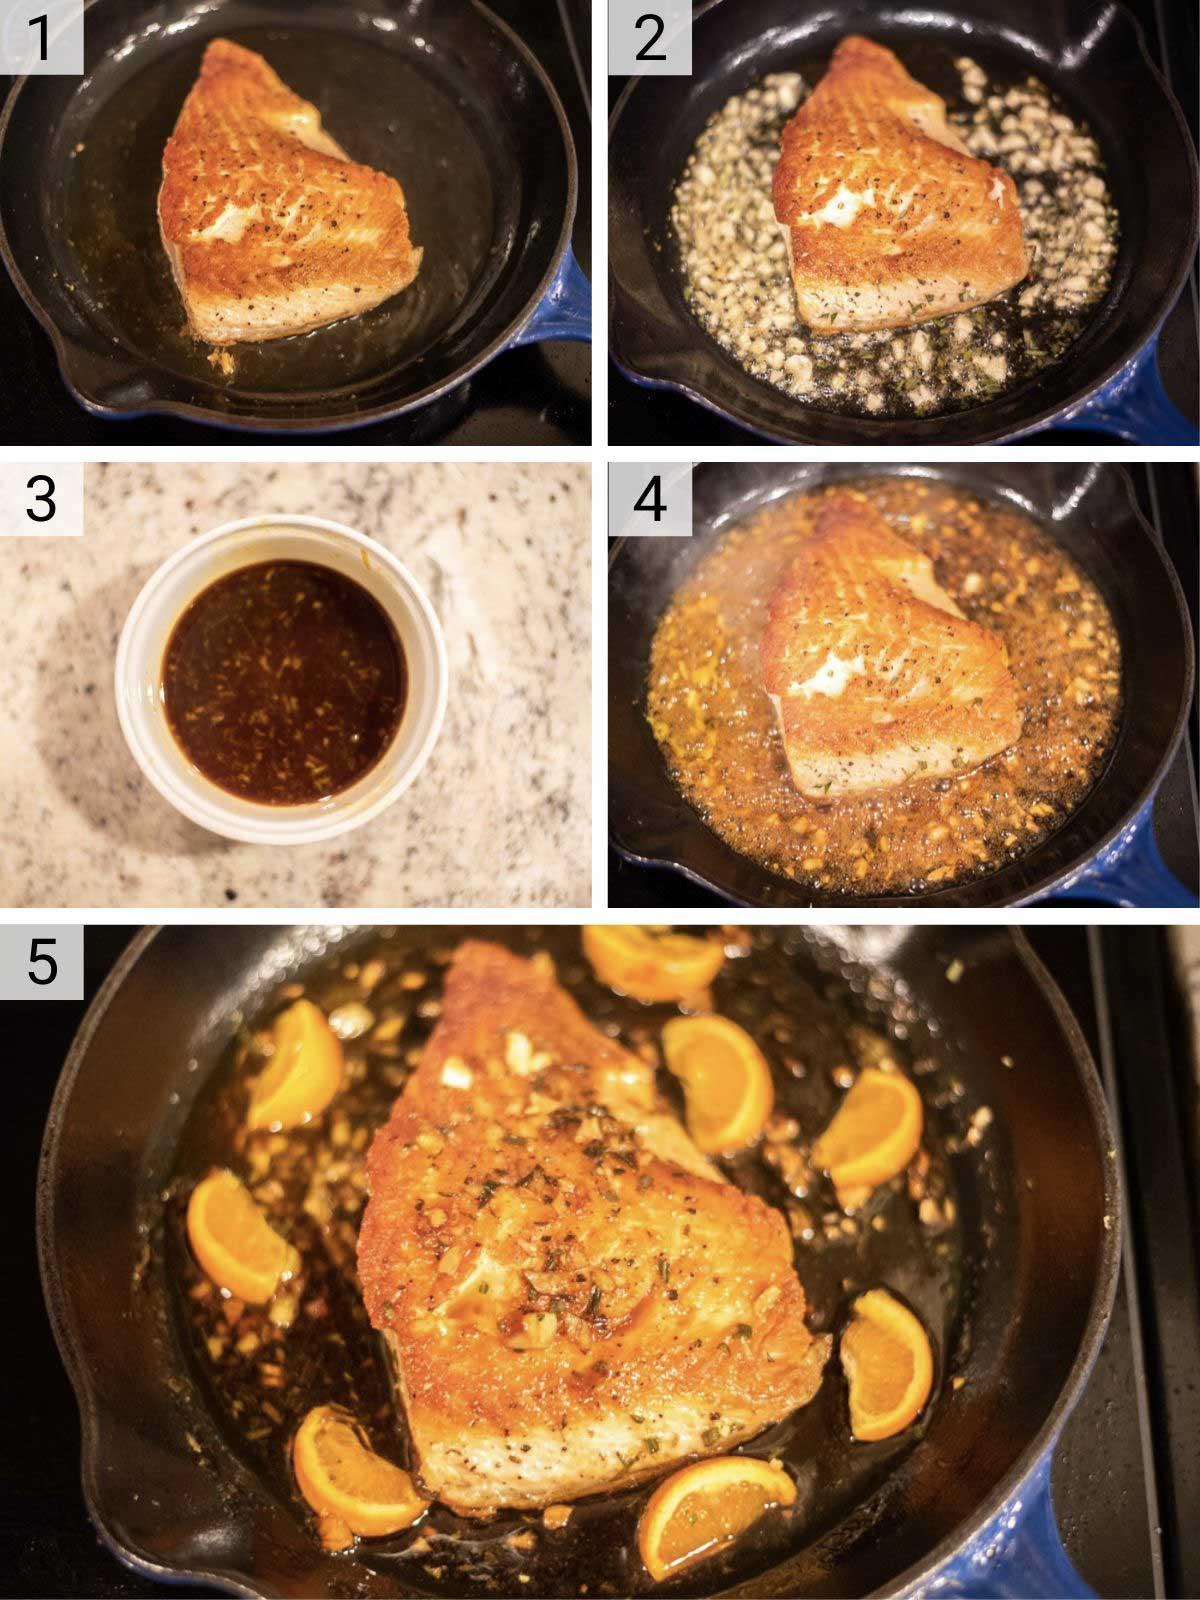 process shots of how to make orange glazed salmon